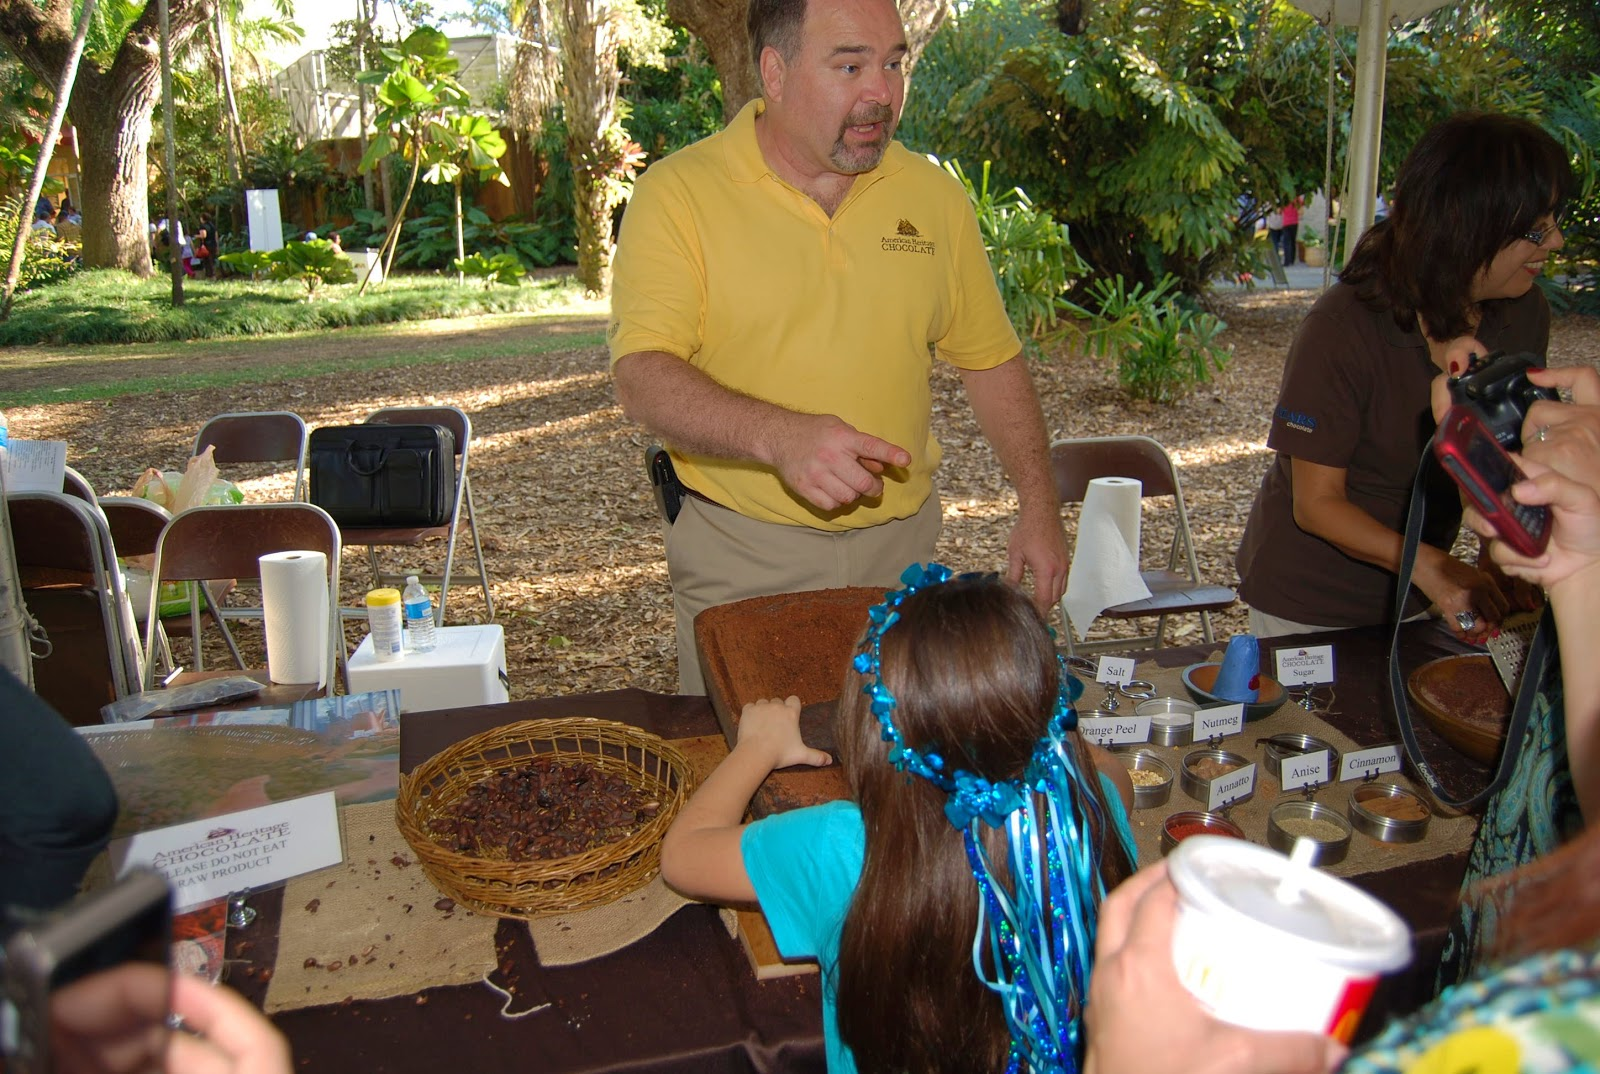 Helen A. Lockey: Chocolate Festival, Fairchild Tropical Garden ...